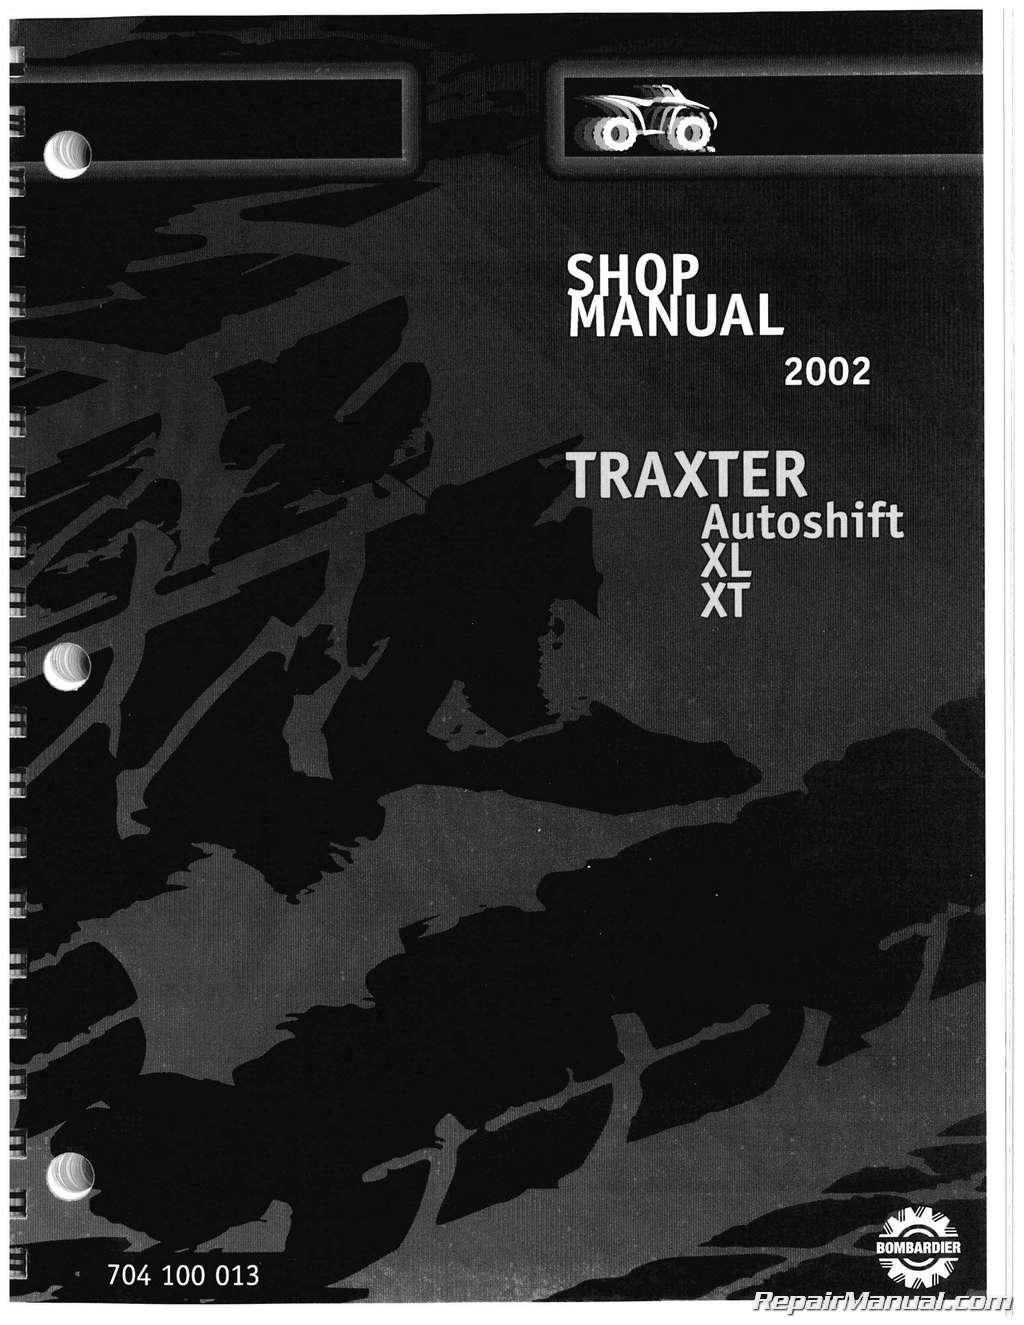 2002 Bombardier Traxter Autoshift Xl Xt Atv Service Manual